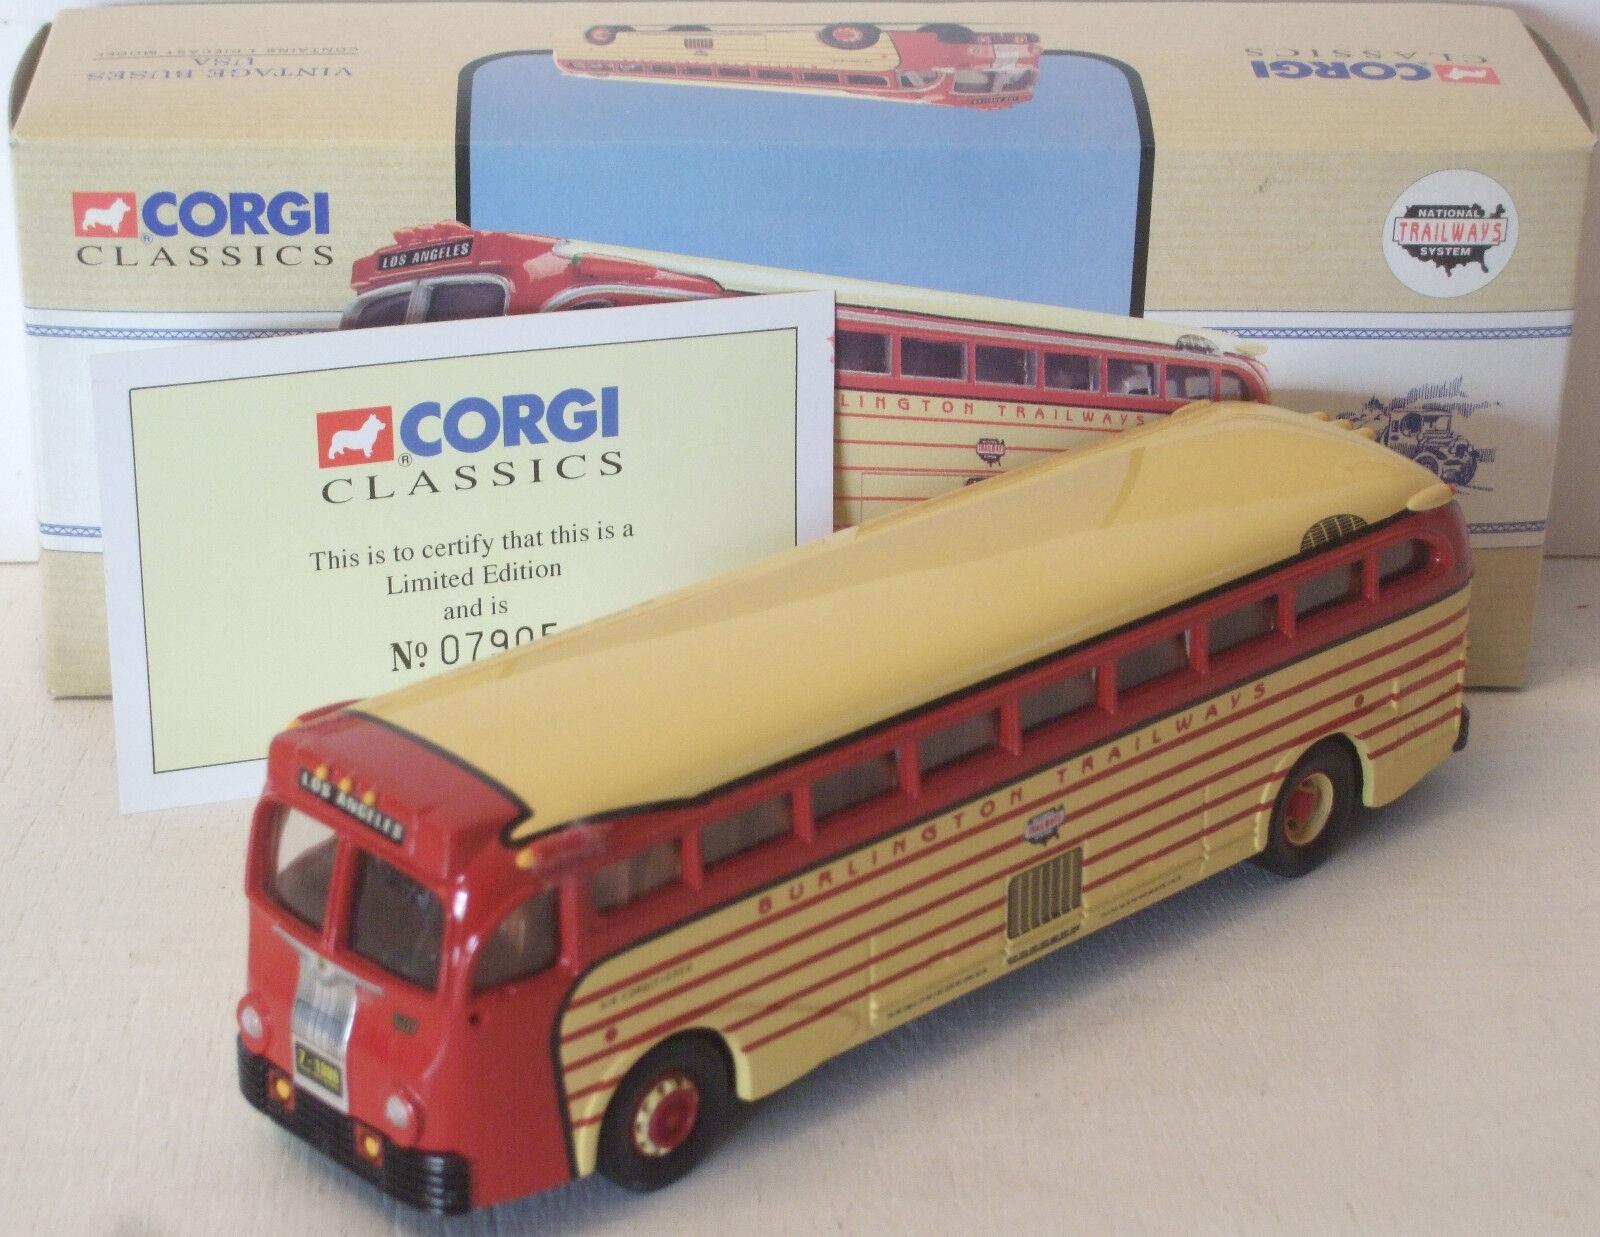 Corgi Classics Burlington Trailways Bus 743 NICE 98465 (see photos)